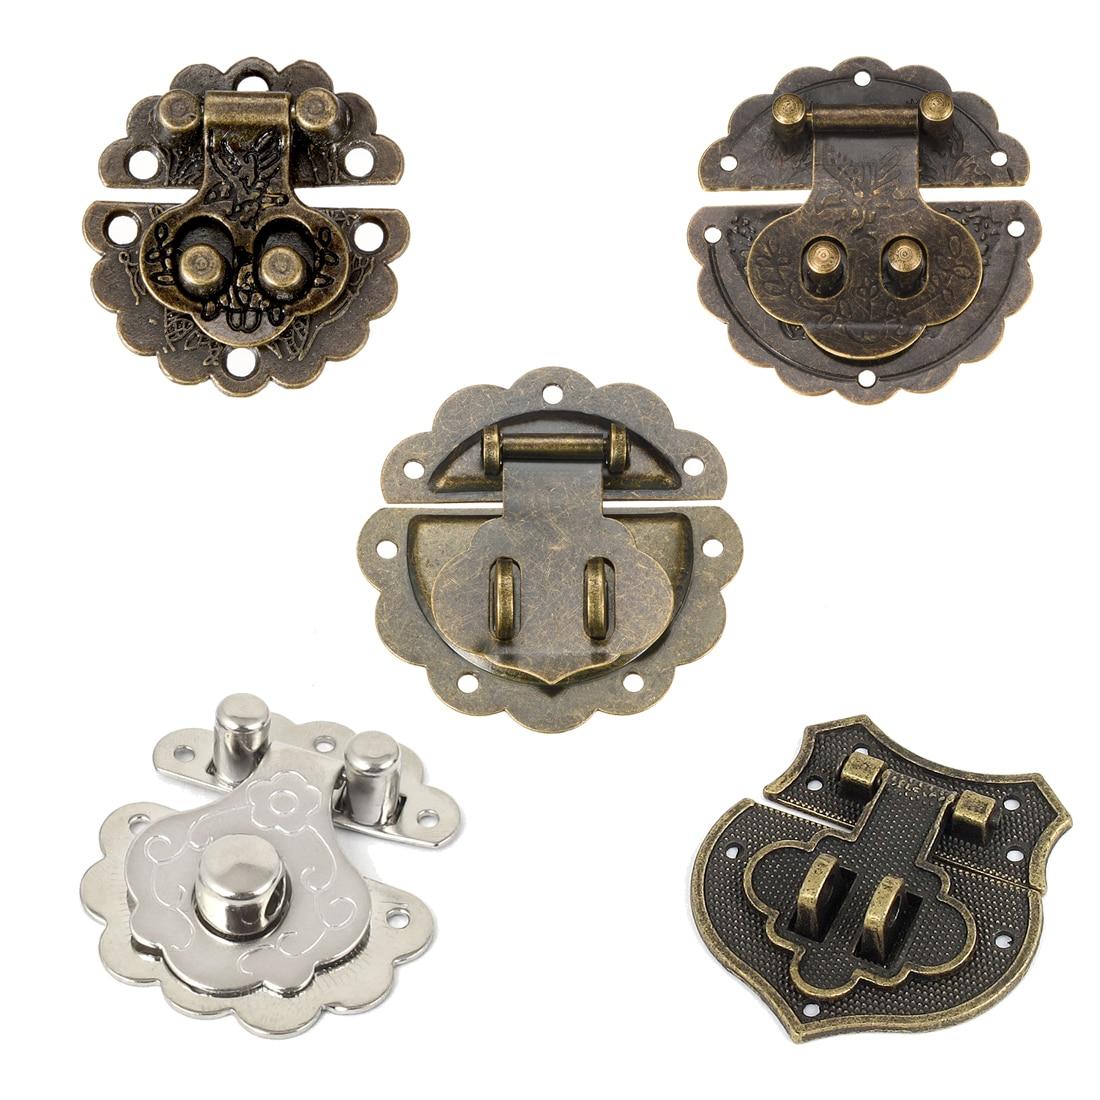 Uxcell 1/2/5/10pcs Wood Case Latches Chest Box Rectangle Clasp Closure Hasp Bronze Tone 30x30/40x40/58x58/78x78mm